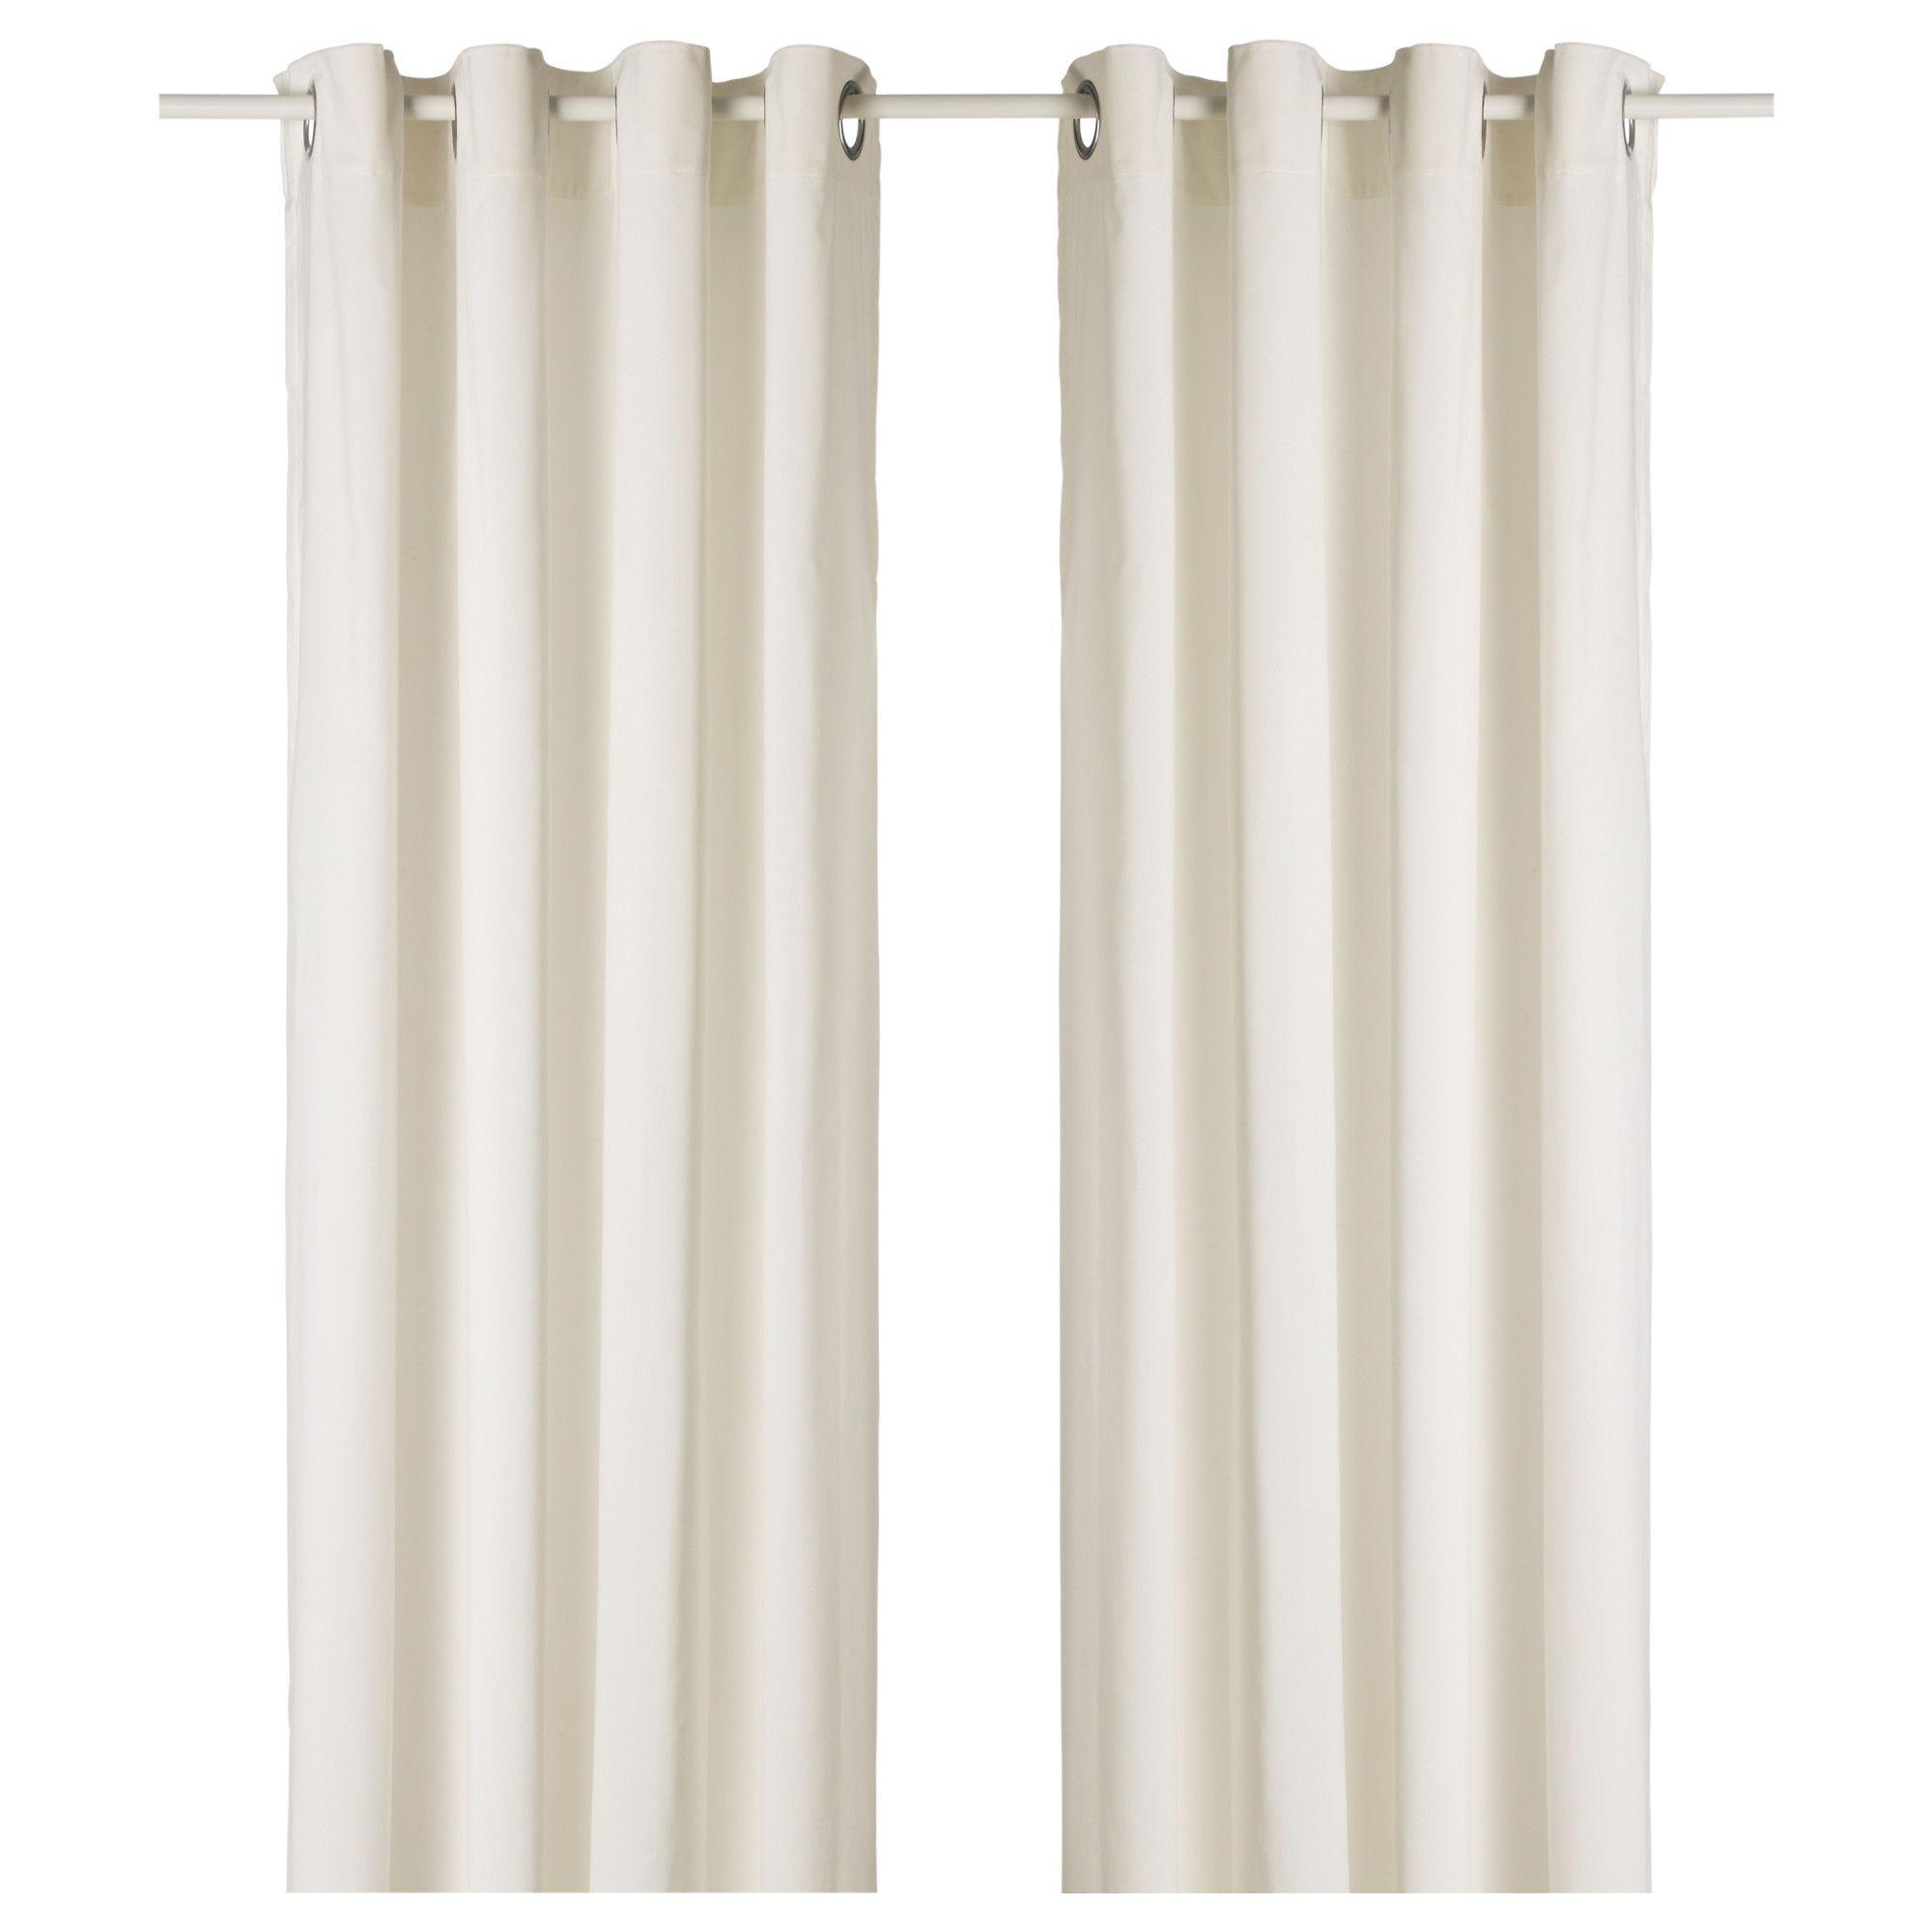 Ikea Us Furniture And Home Furnishings Curtains Ikea Drapery